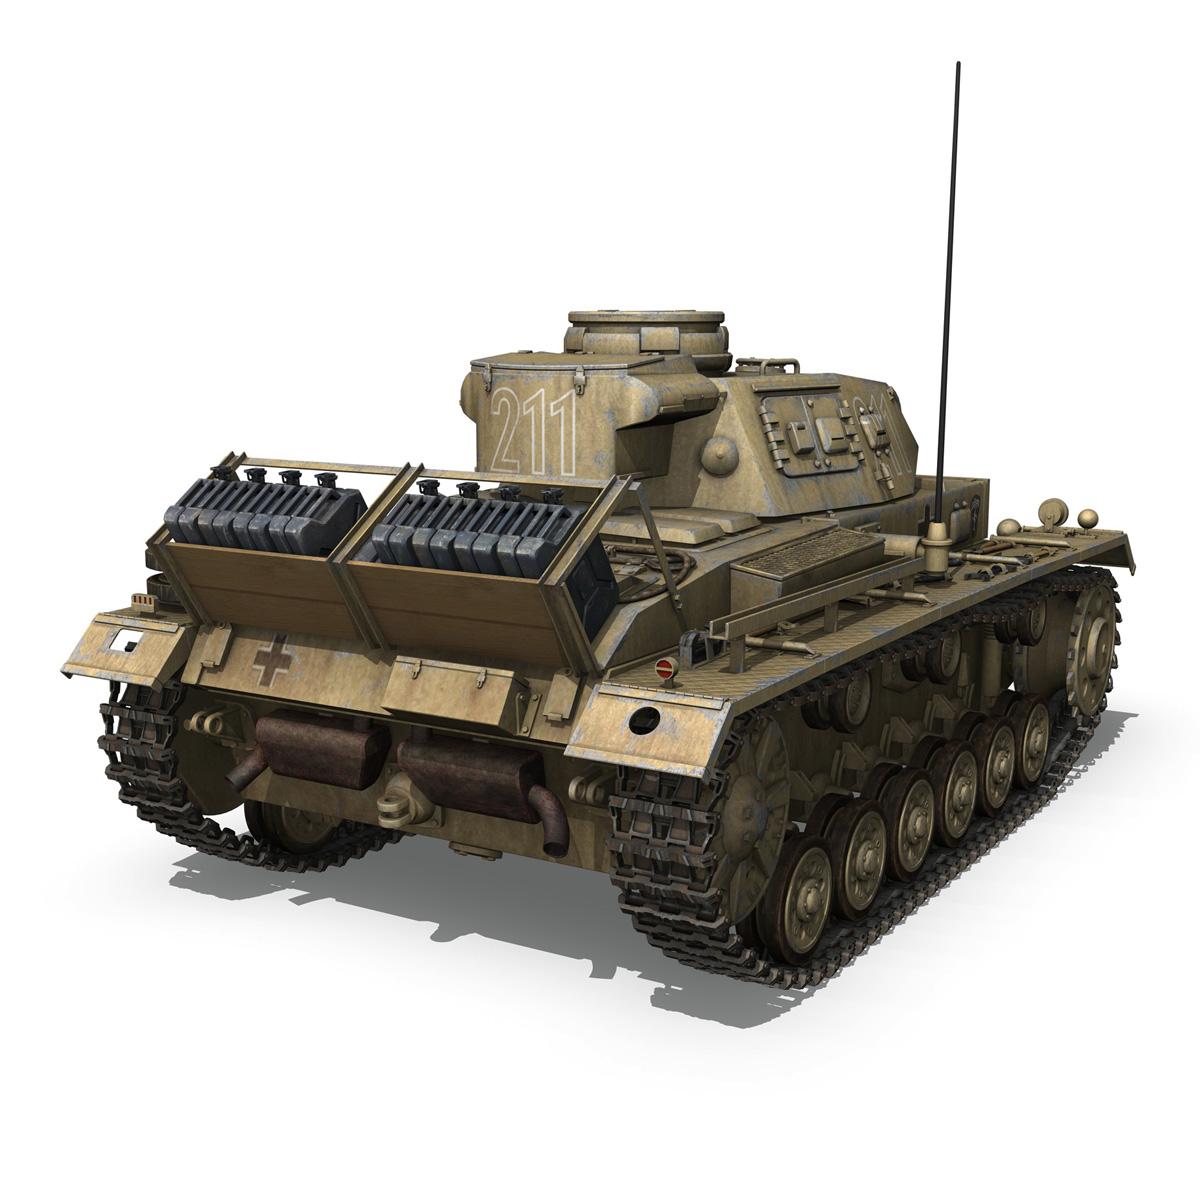 pzkpfw iii – panzer 3 – ausf.g – dak – 211 3d model 3ds c4d fbx lwo lw lws obj 266467